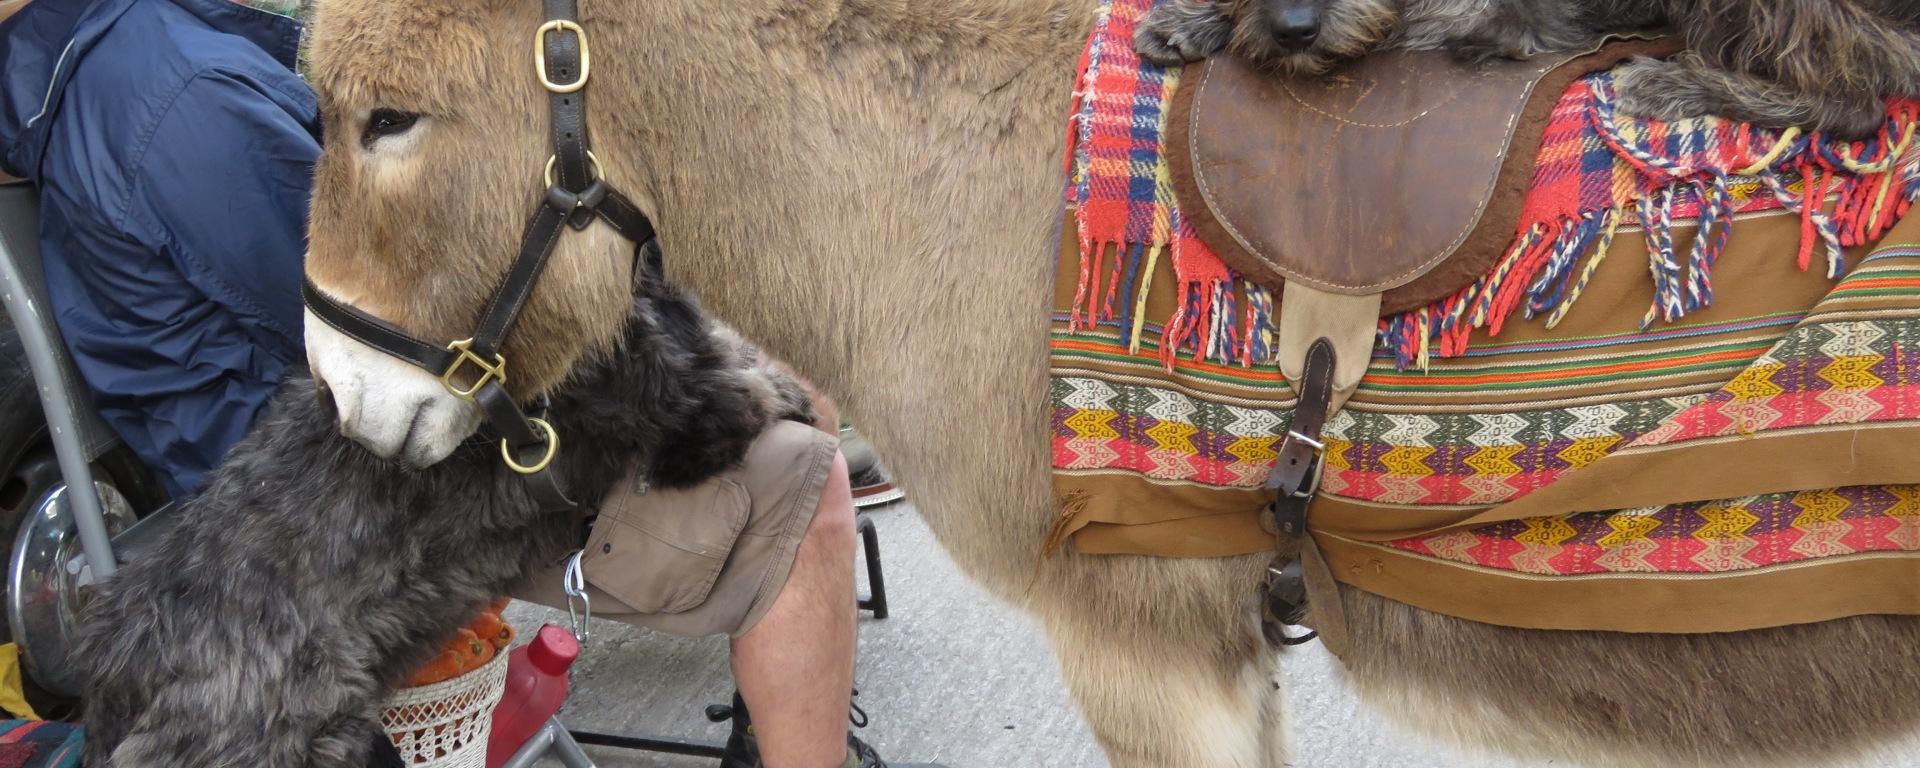 Pups and Donkeys Taking a Rest - Dingle Ireland - by Anika Mikkelson - Miss Maps - www.MissMaps.com